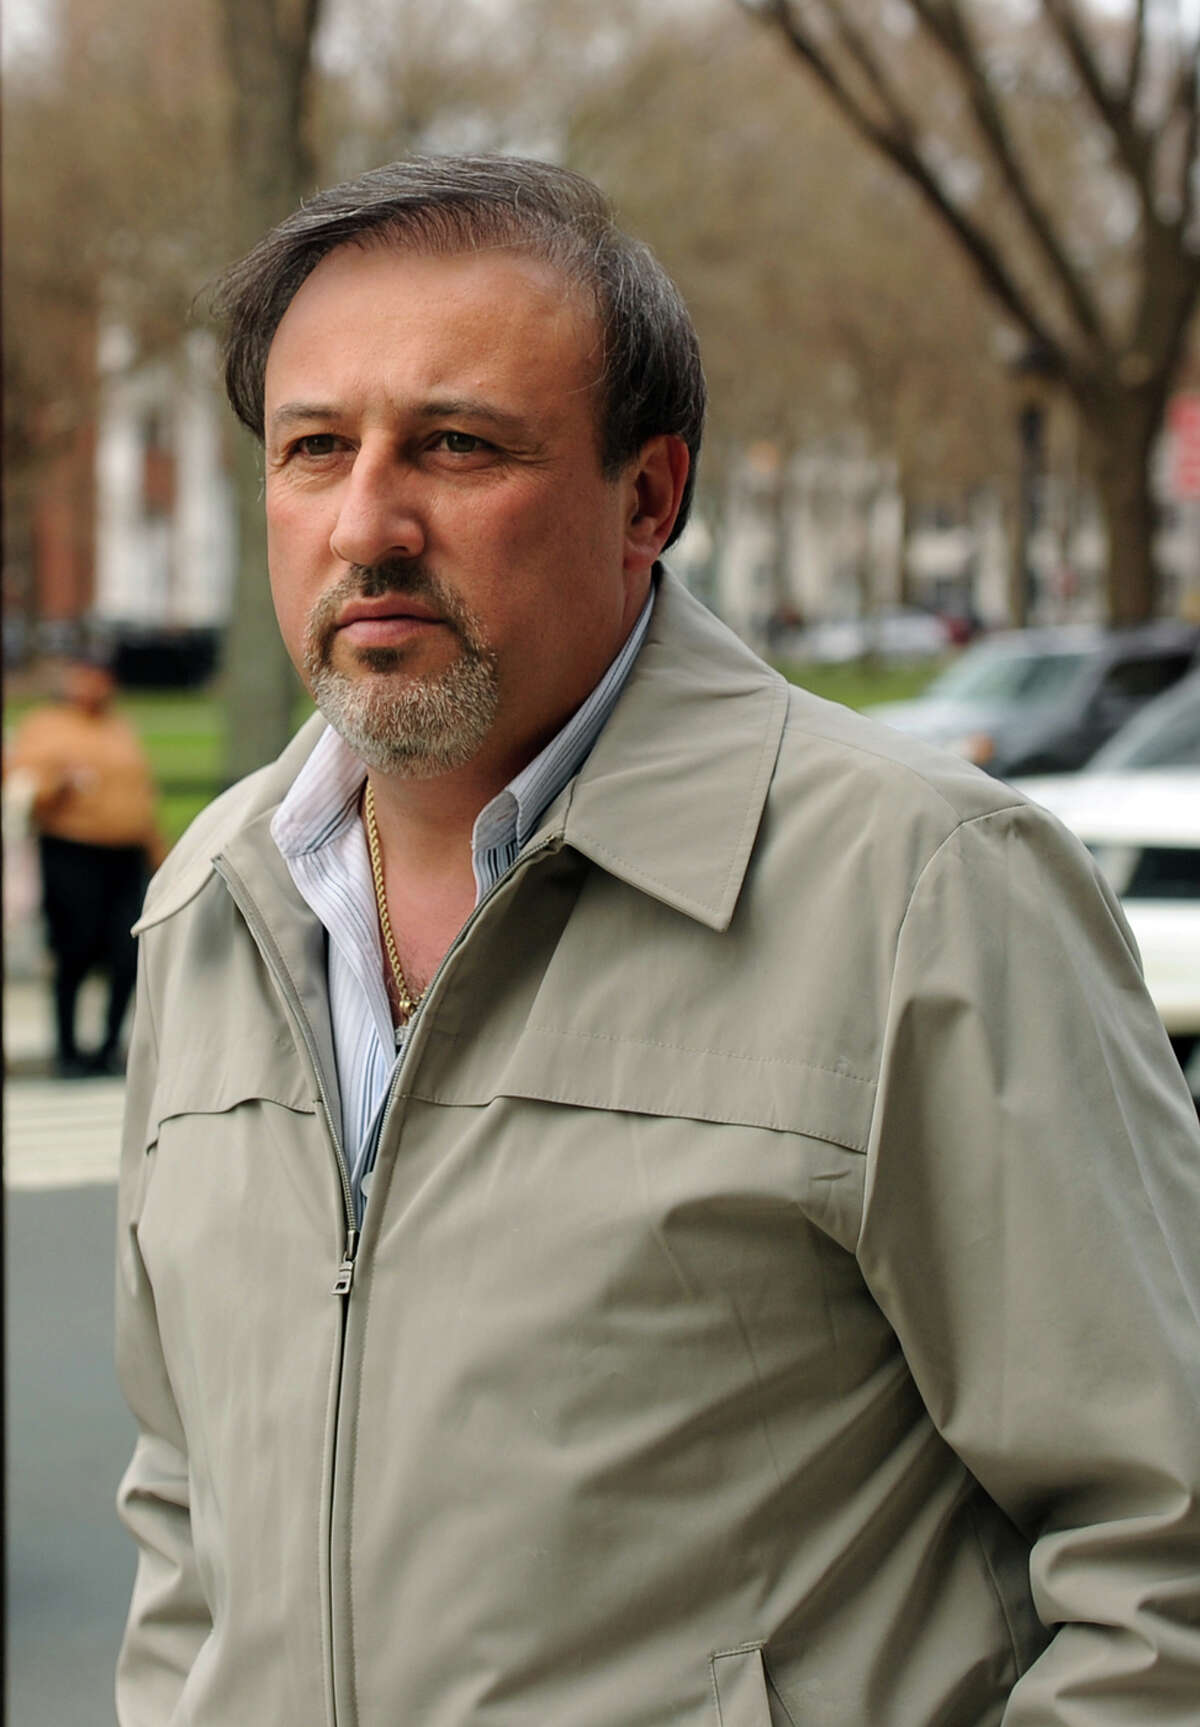 Shelton developer James Botti leaves US District Court in New Haven on Mar. 26, 2010.